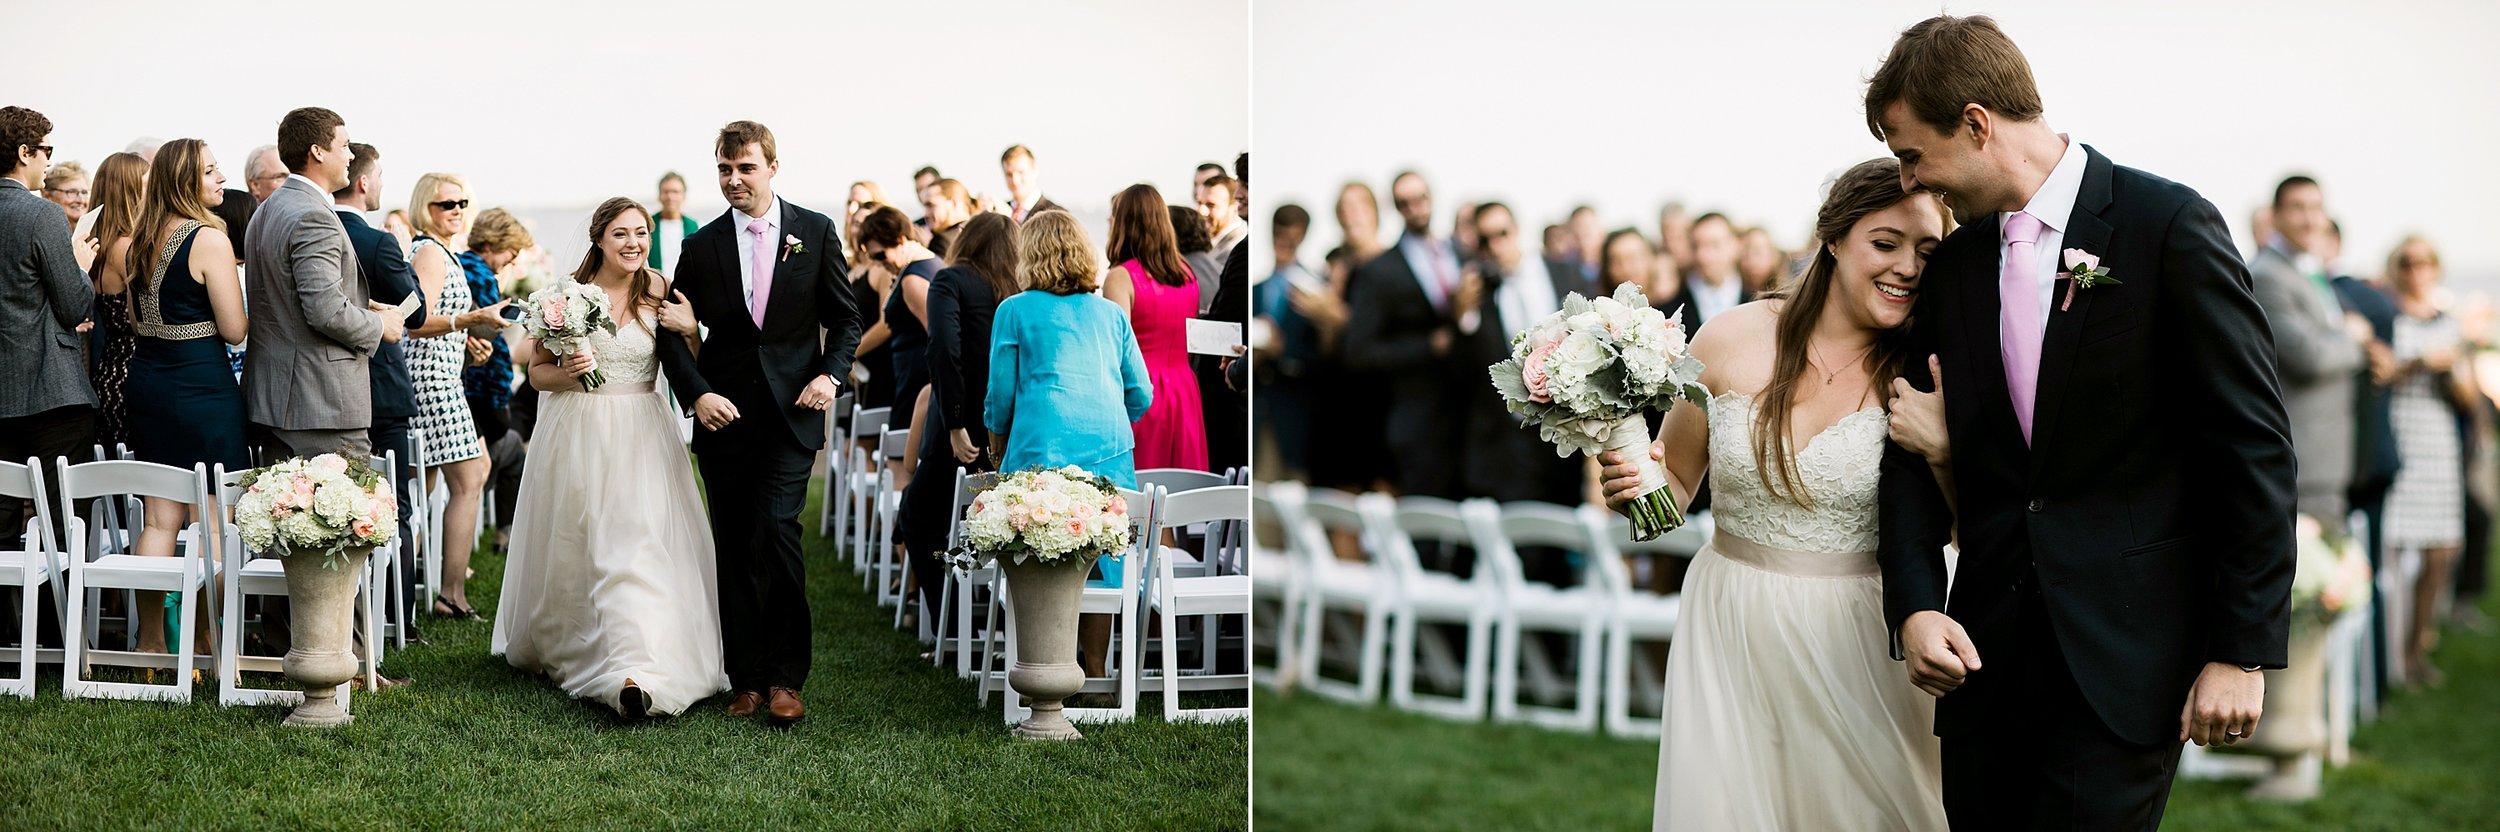 036 los angeles wedding photographer todd danforth photography boston.jpg